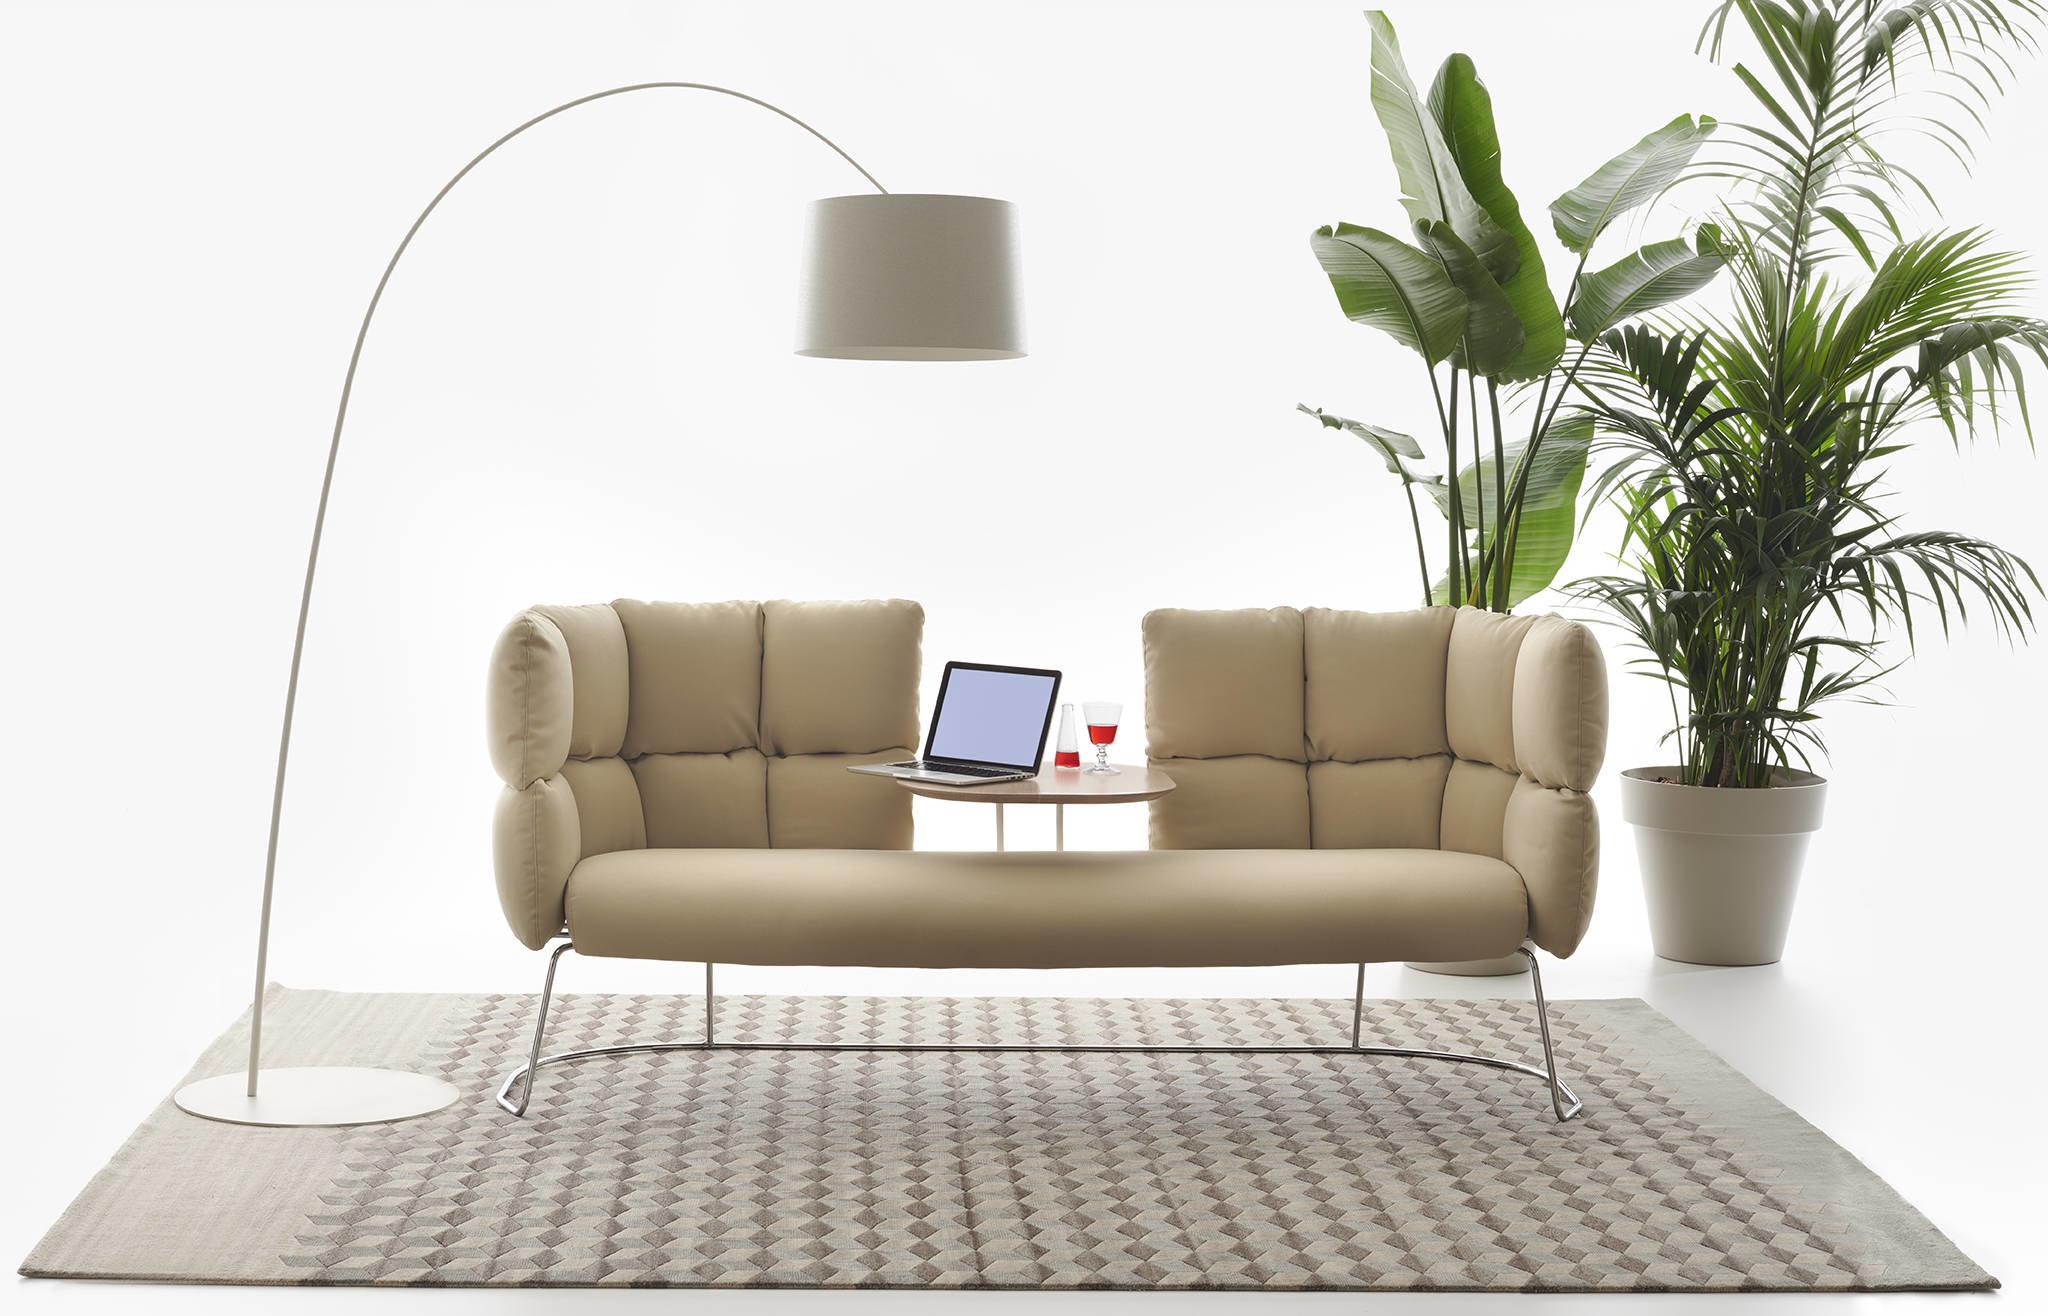 Europa Divani Design Srl.Manerba Design Furniture For Offices Manerbaspa Com